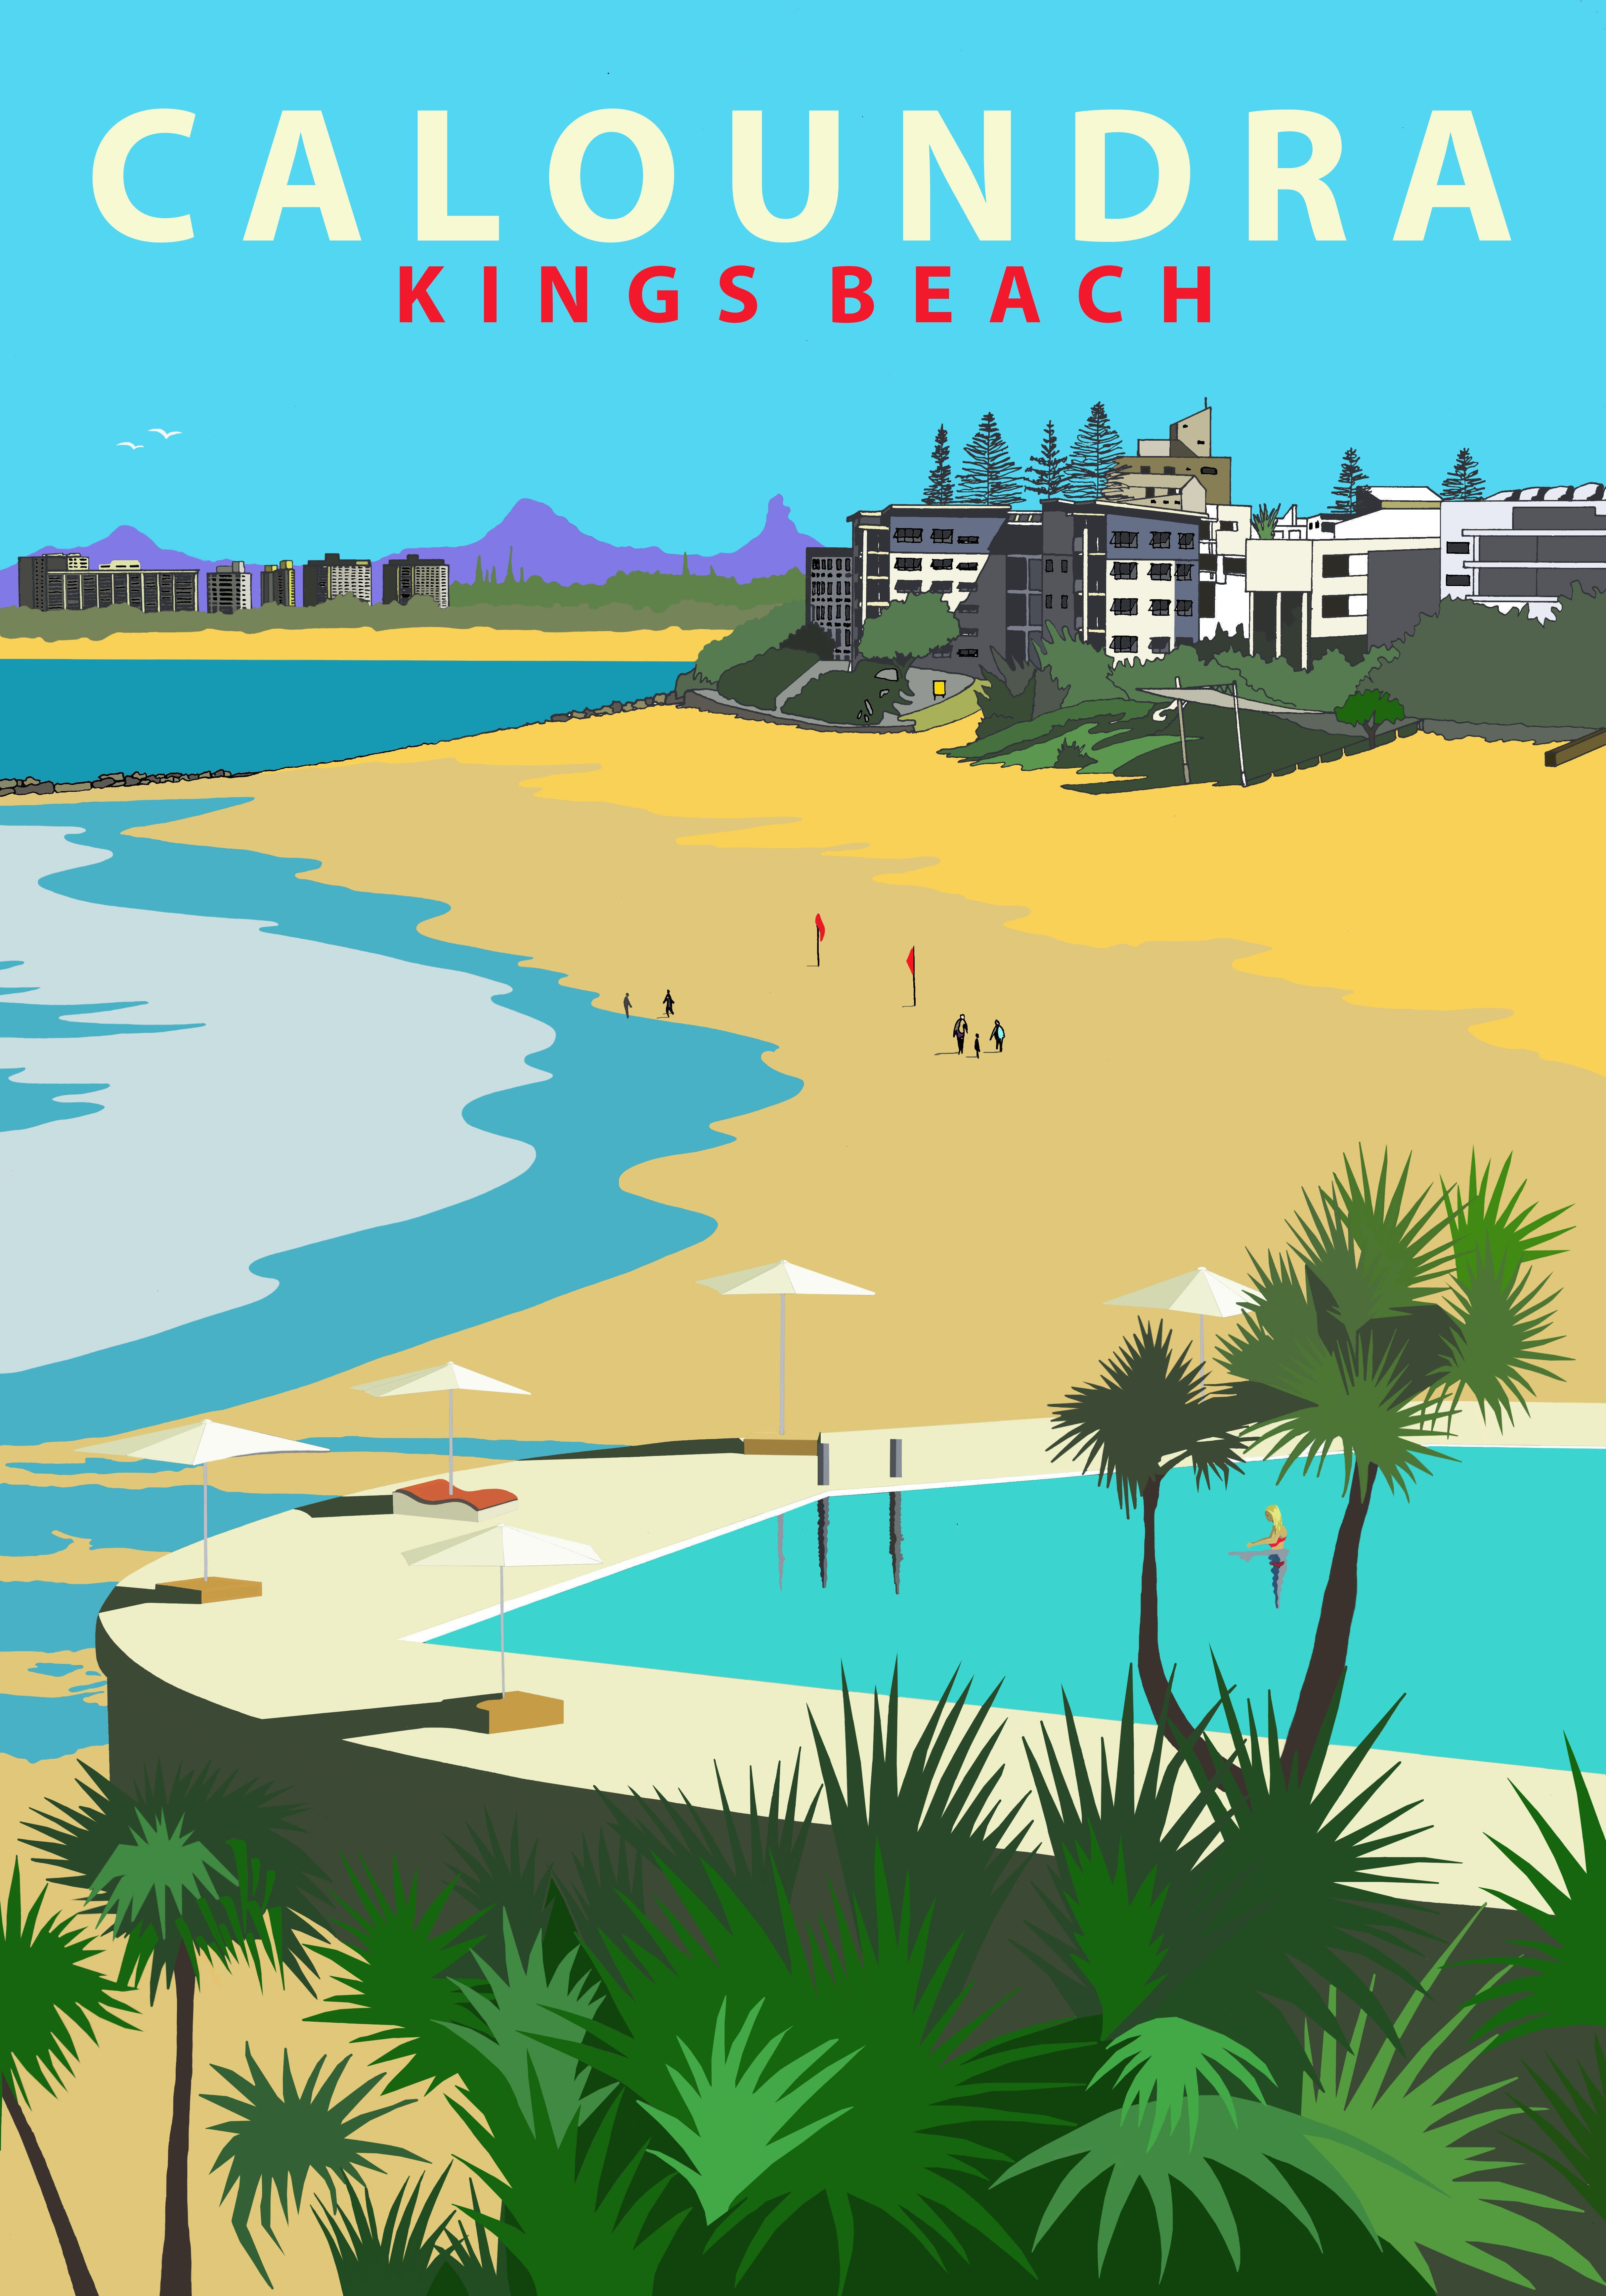 Australian retro travel poster kings beach caloundra